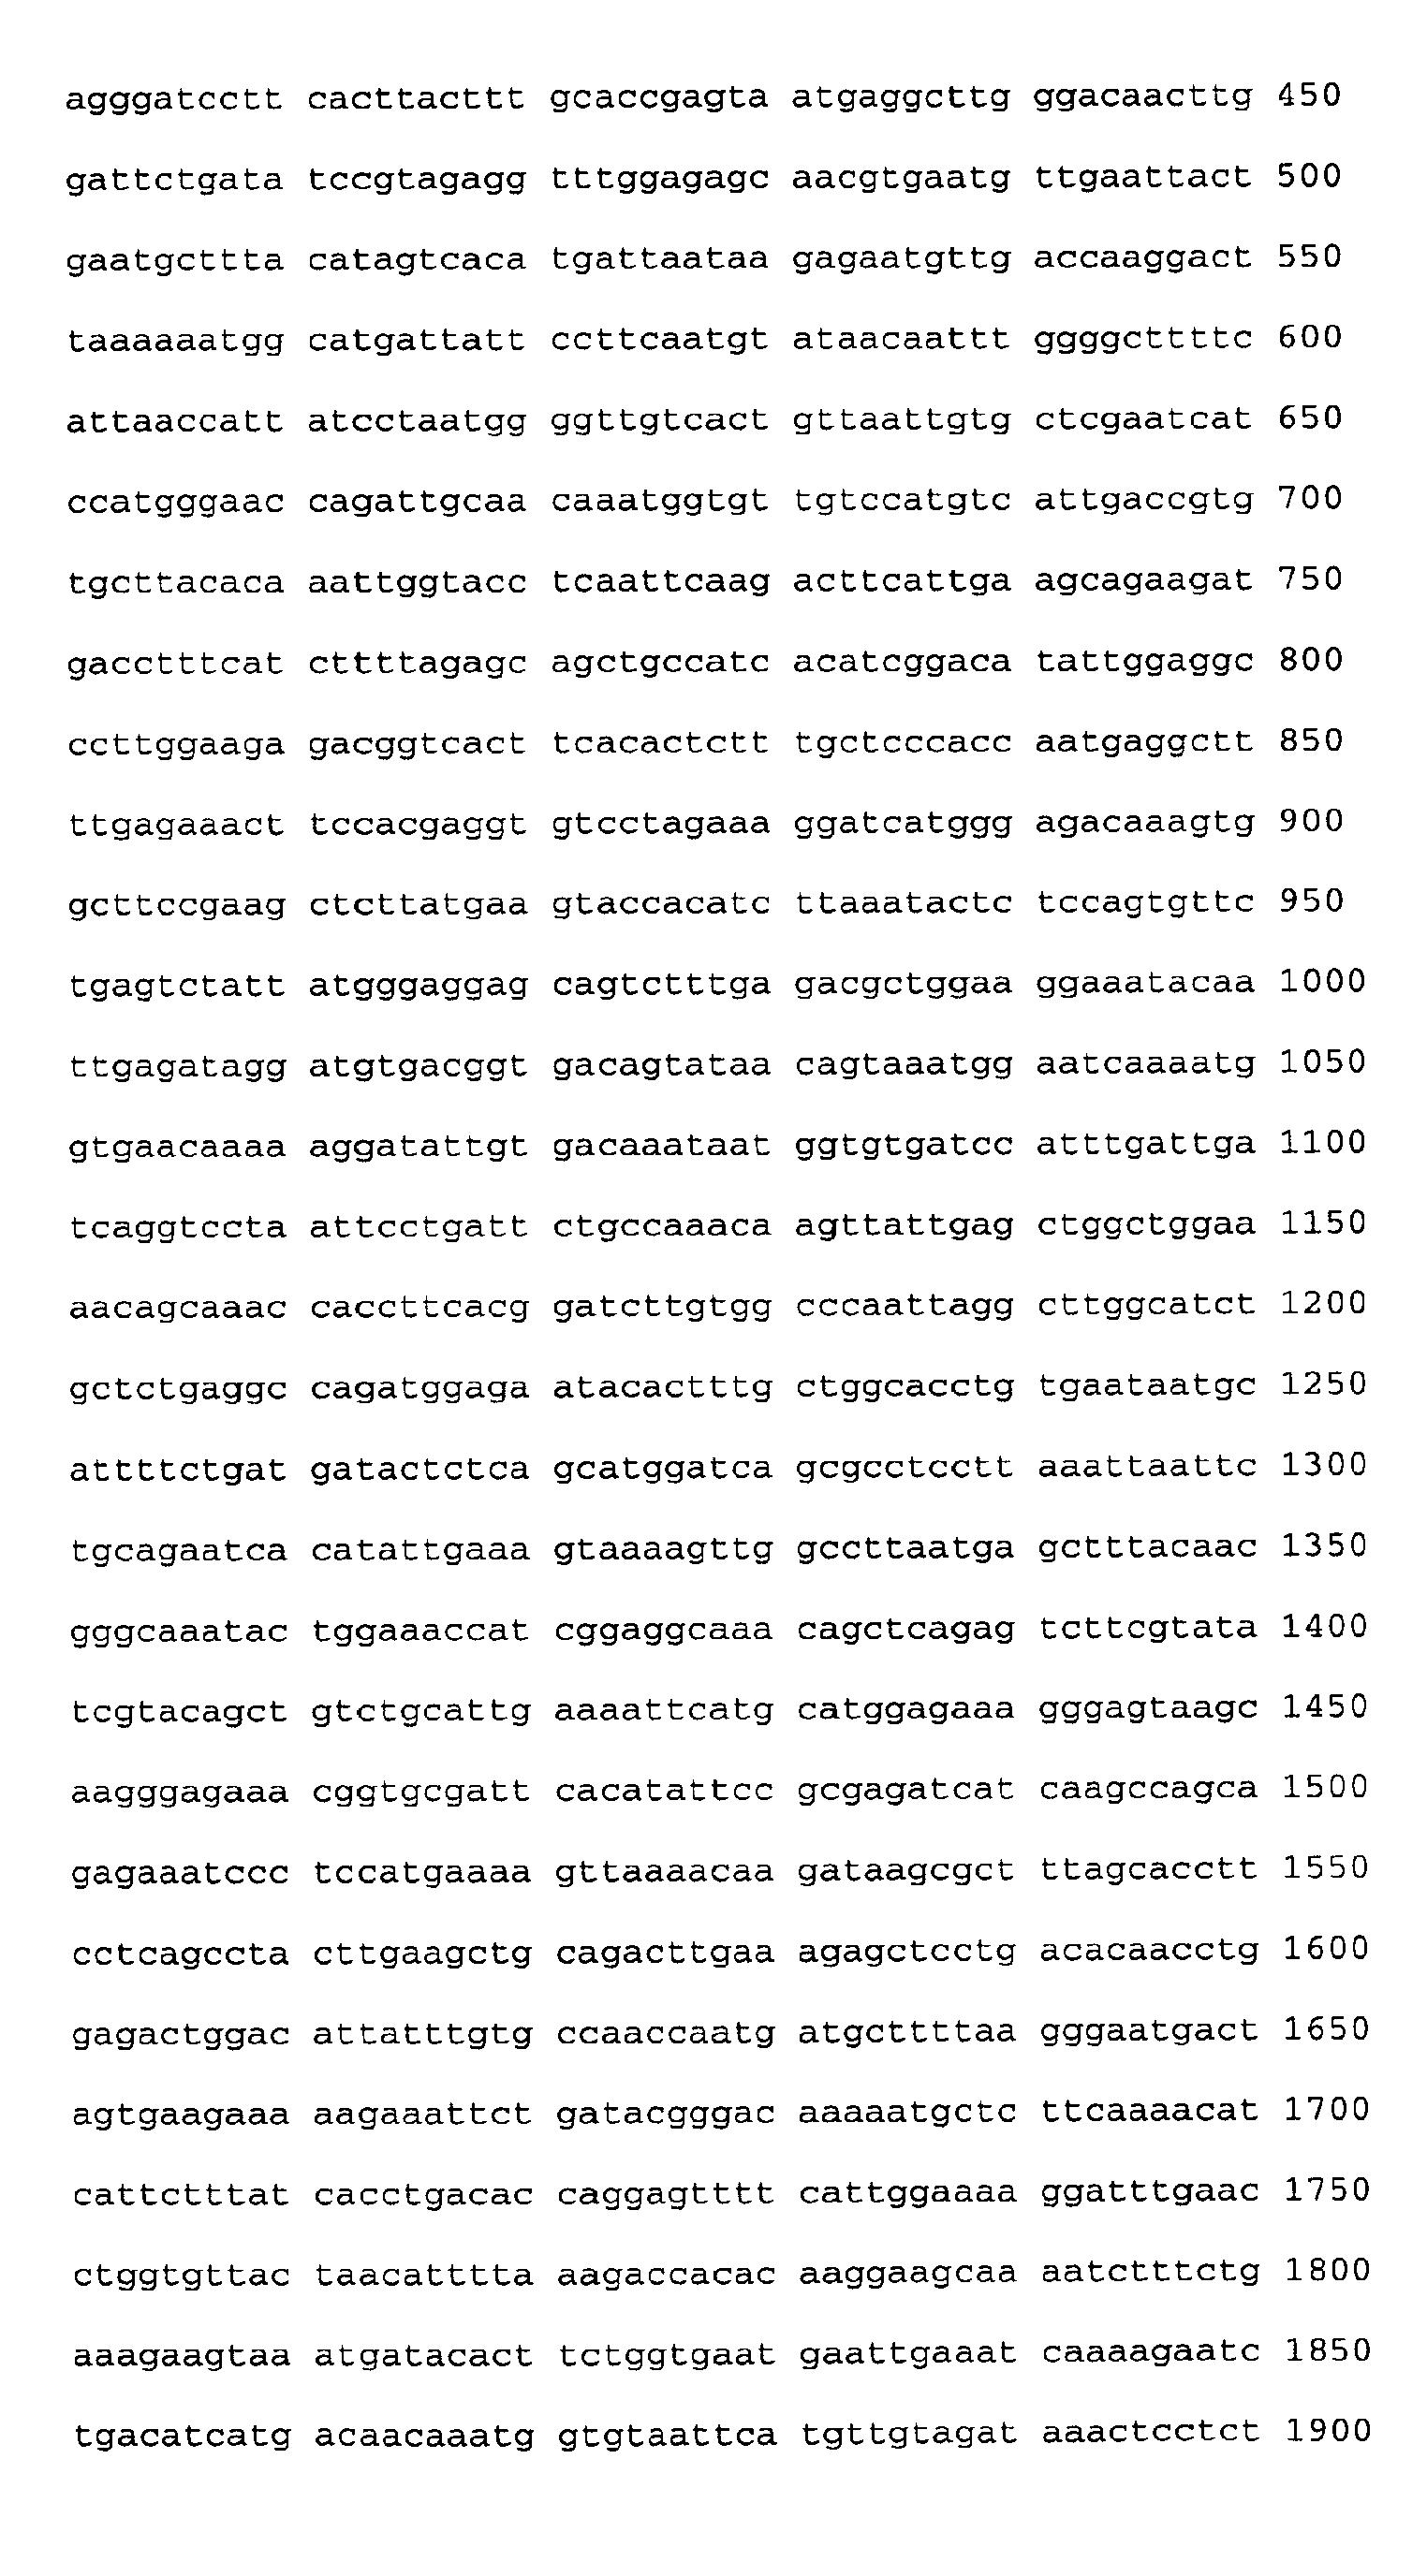 Figure imgb0098